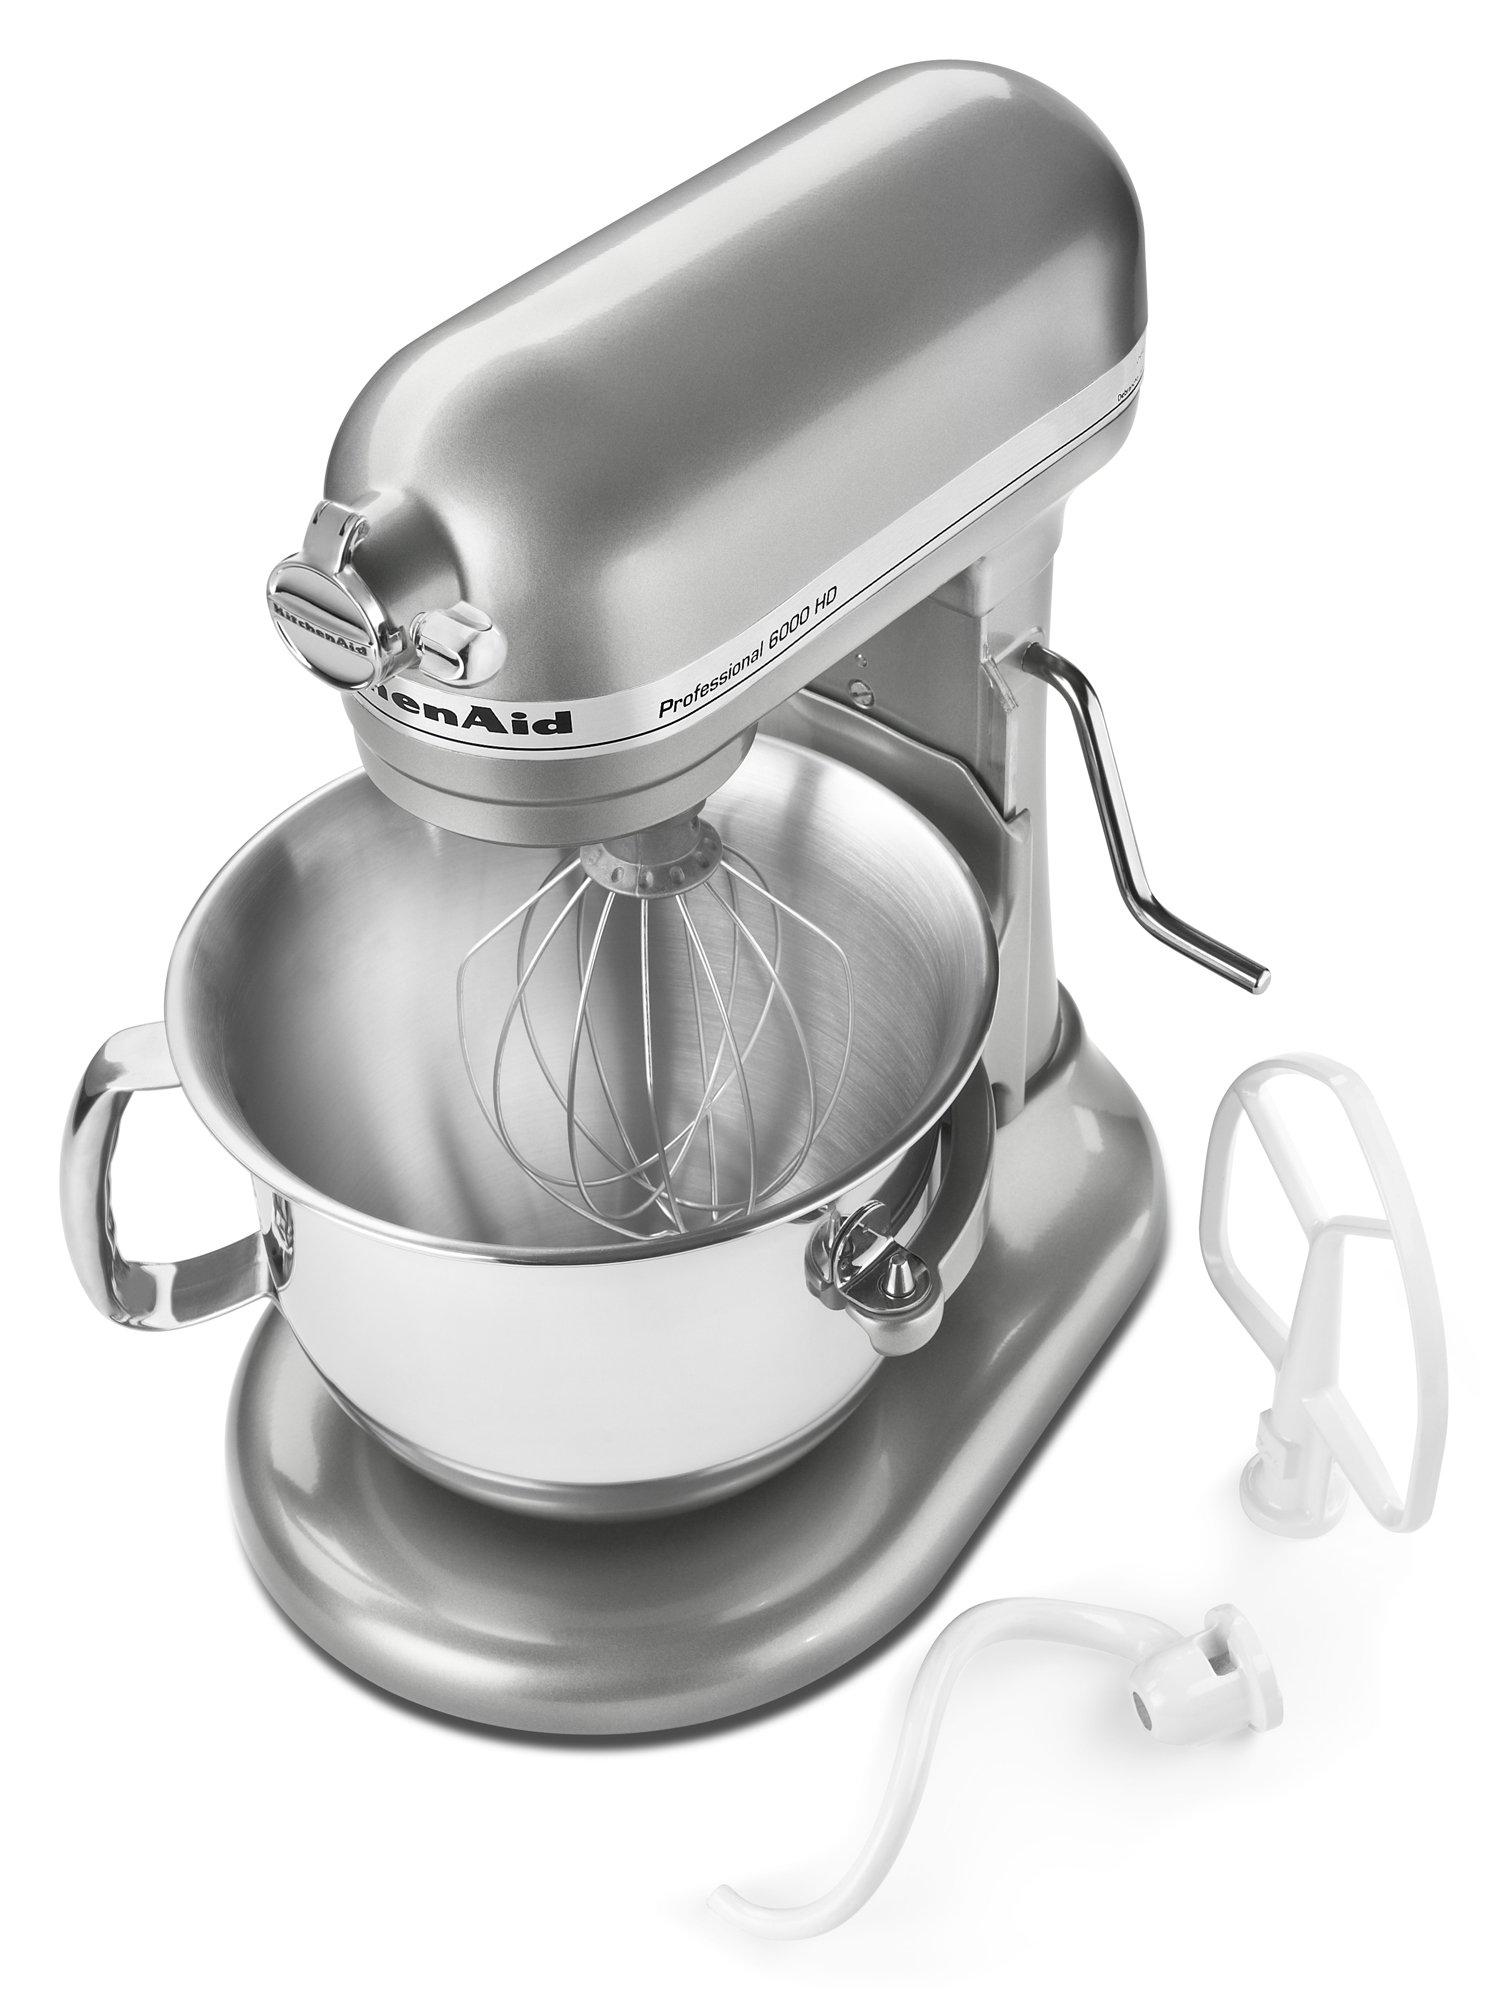 KitchenAid Professional 6000 HD KSM6573CCU Stand Mixer, 6 Quart, Contour Silver by KitchenAid (Image #2)